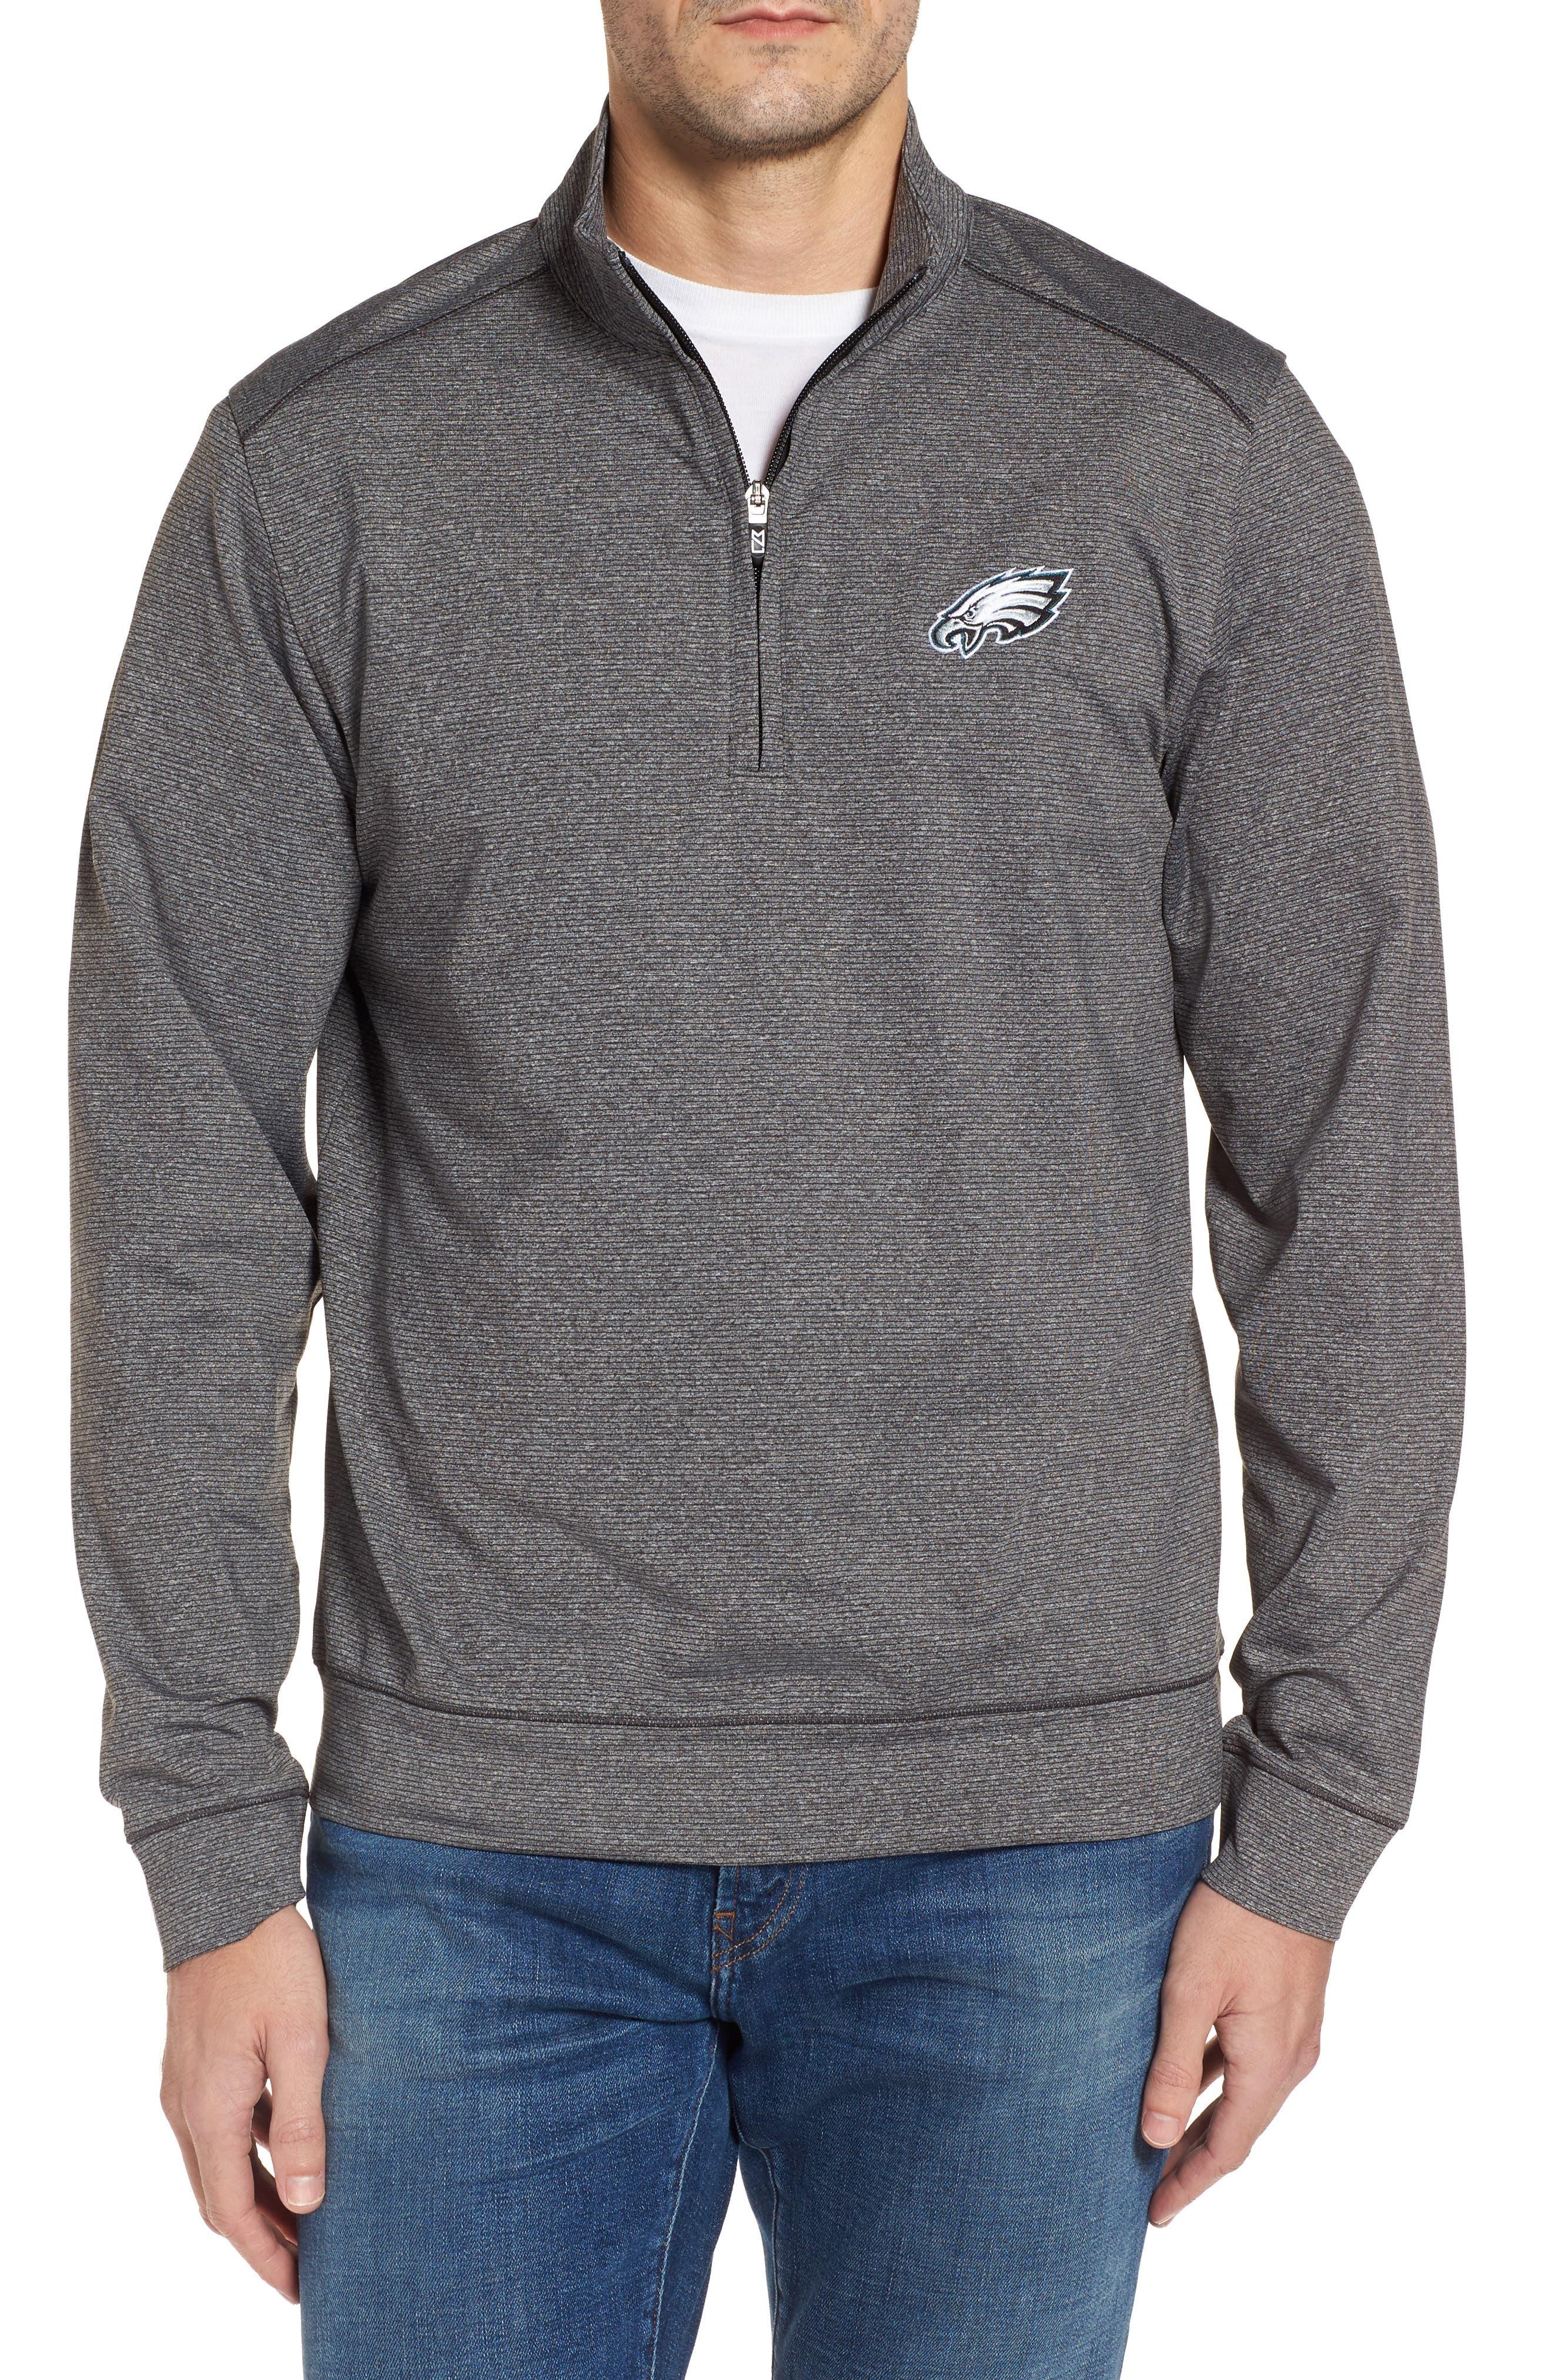 Shoreline - Philadelphia Eagles Half Zip Sweatshirt,                             Main thumbnail 1, color,                             Charcoal Heather